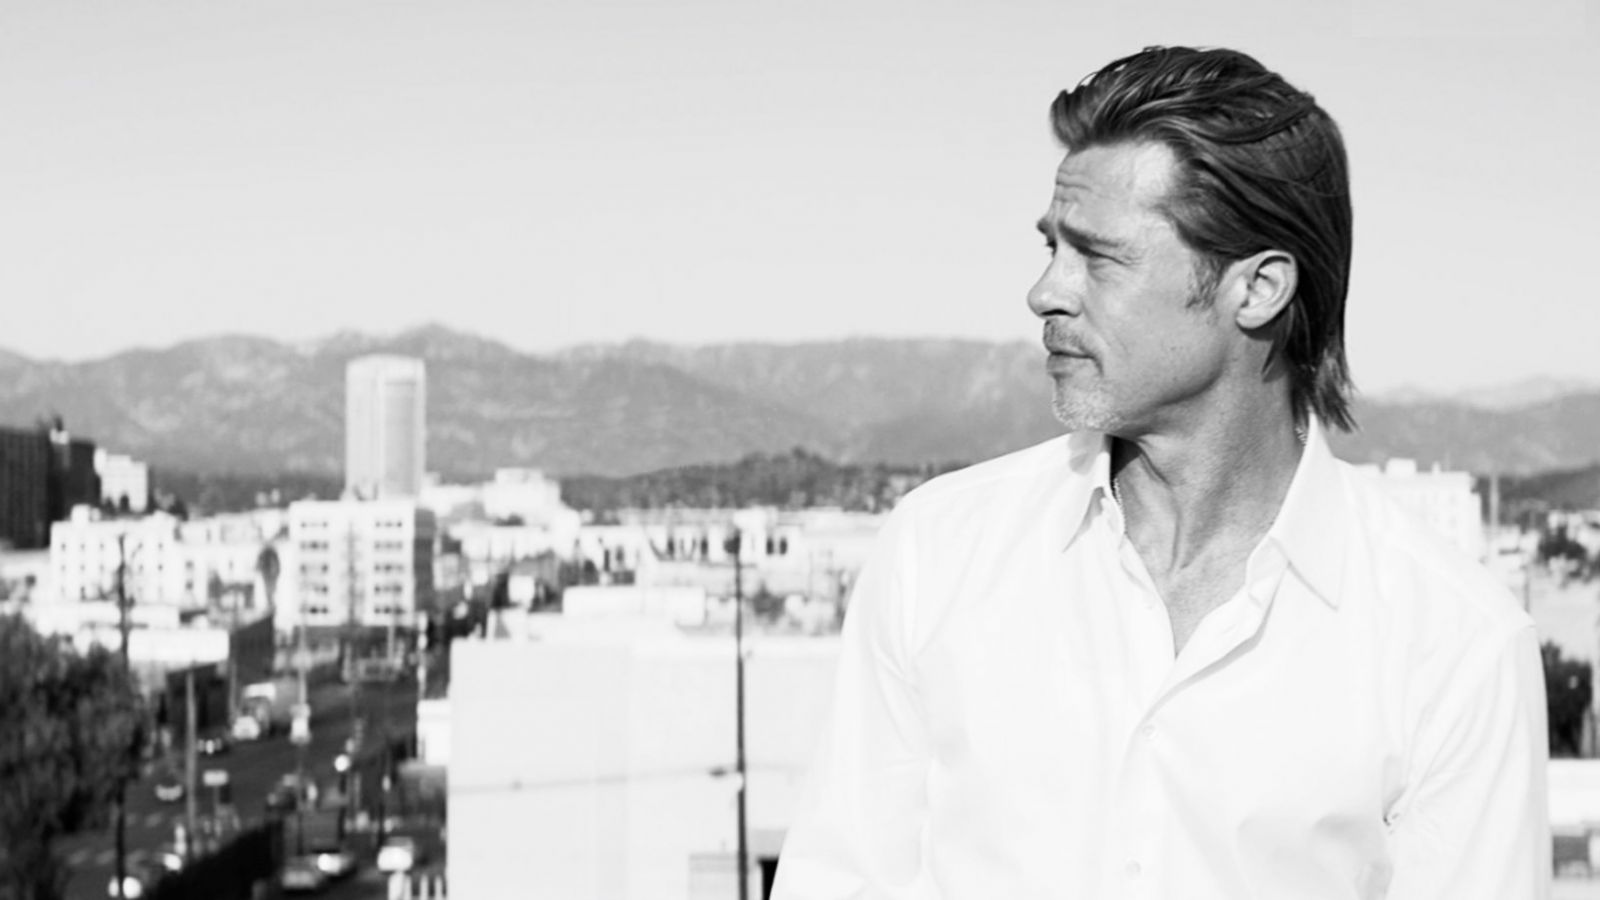 Brad Pitt: Είναι το πρόσωπο της νέας καμπάνιας του οίκου Brioni και είναι ακόμη καλύτερος από τα νεανικά του χρόνια στο modelling